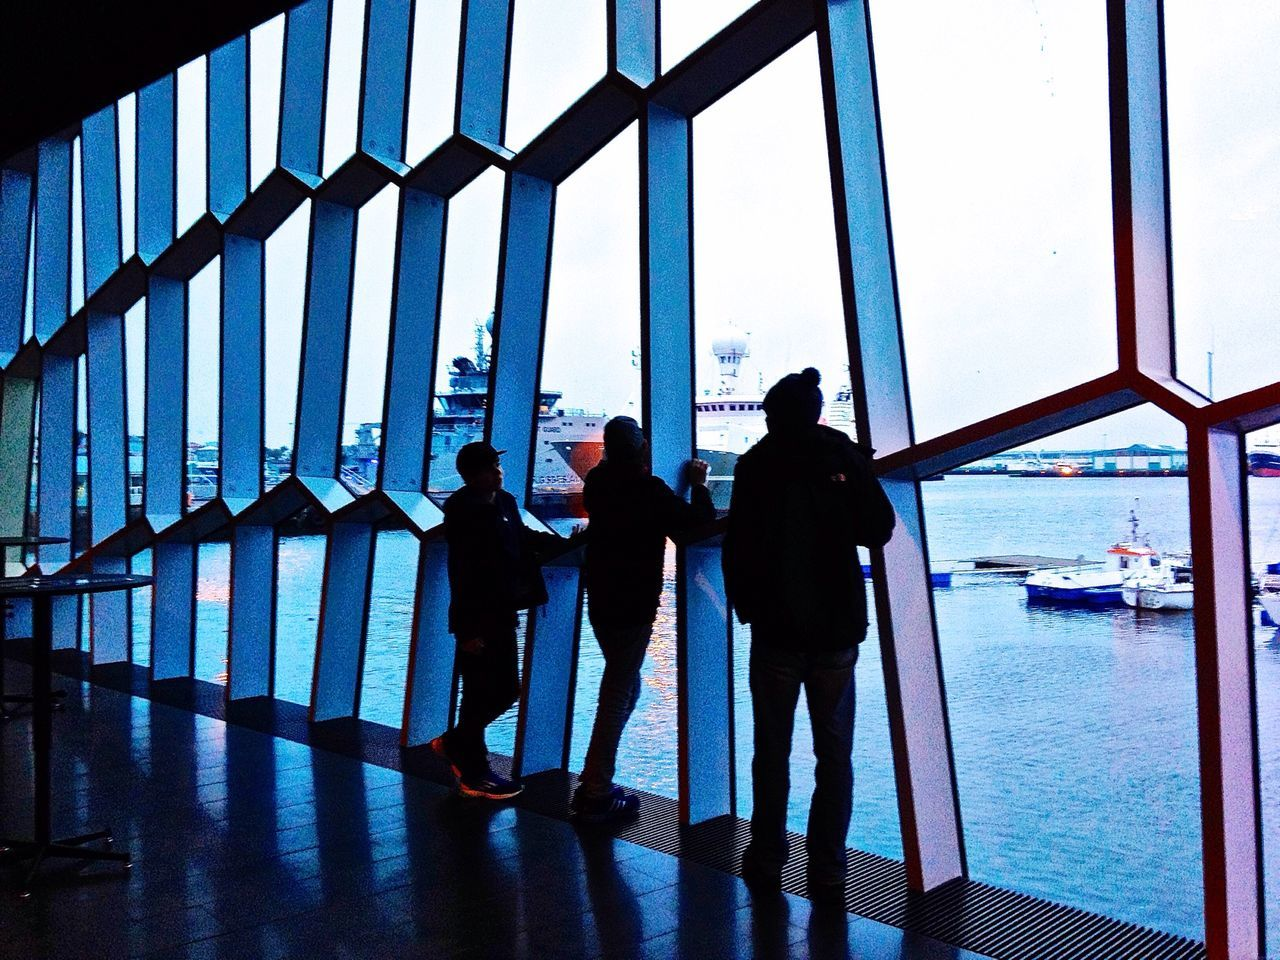 Konzerthaus Harpa in Reykjavik Iceland Iceland Iceland_collection Iceland Memories Architecture Reykjavik Harpa Konzerthaus Olafur Eliasson Amazing Architecture Architectural Detail